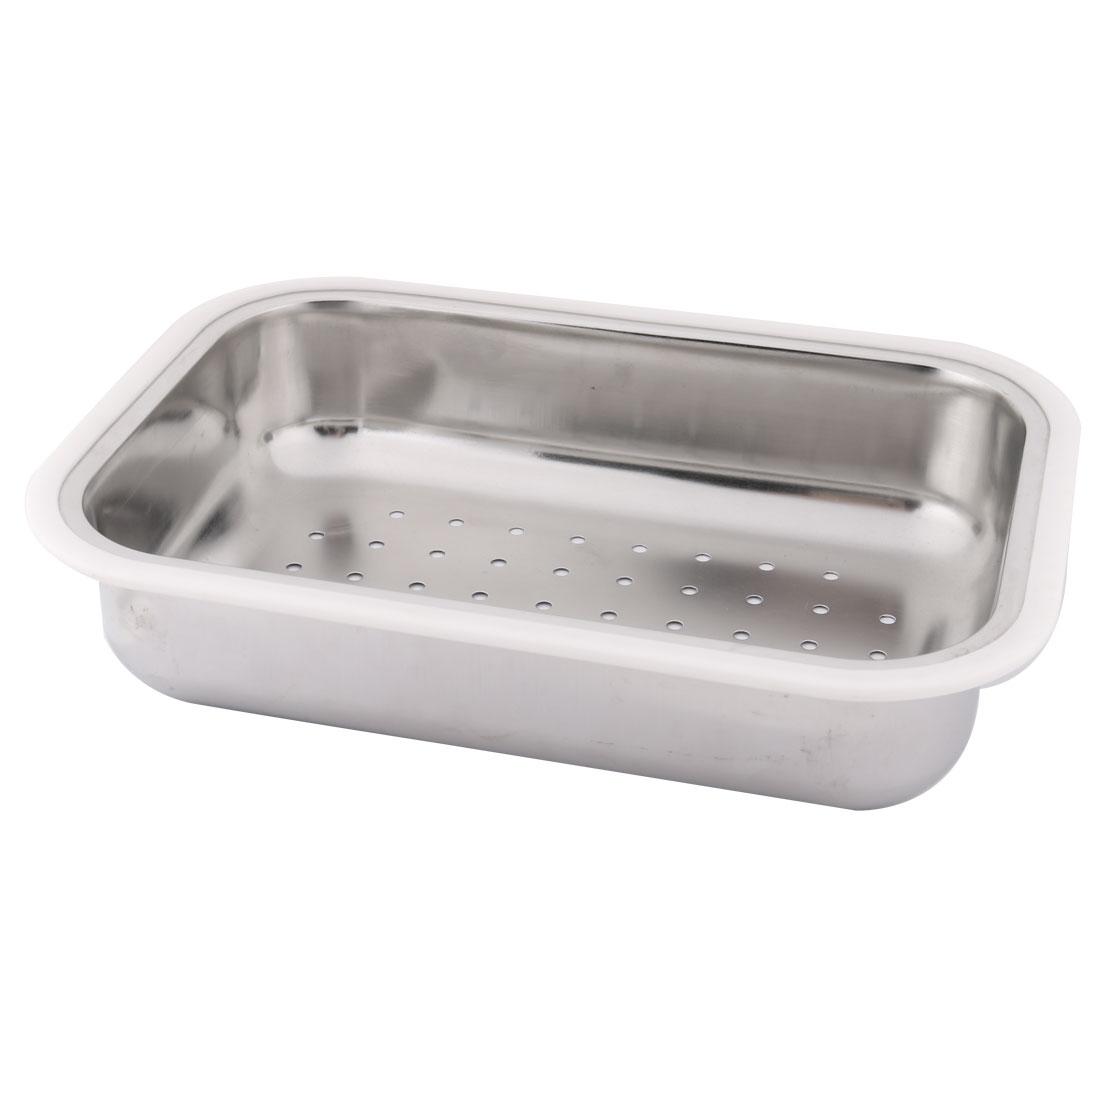 Kitchen Stainless Steel Vegetable Washing Basin Silver Tone White 35cm x 25cm